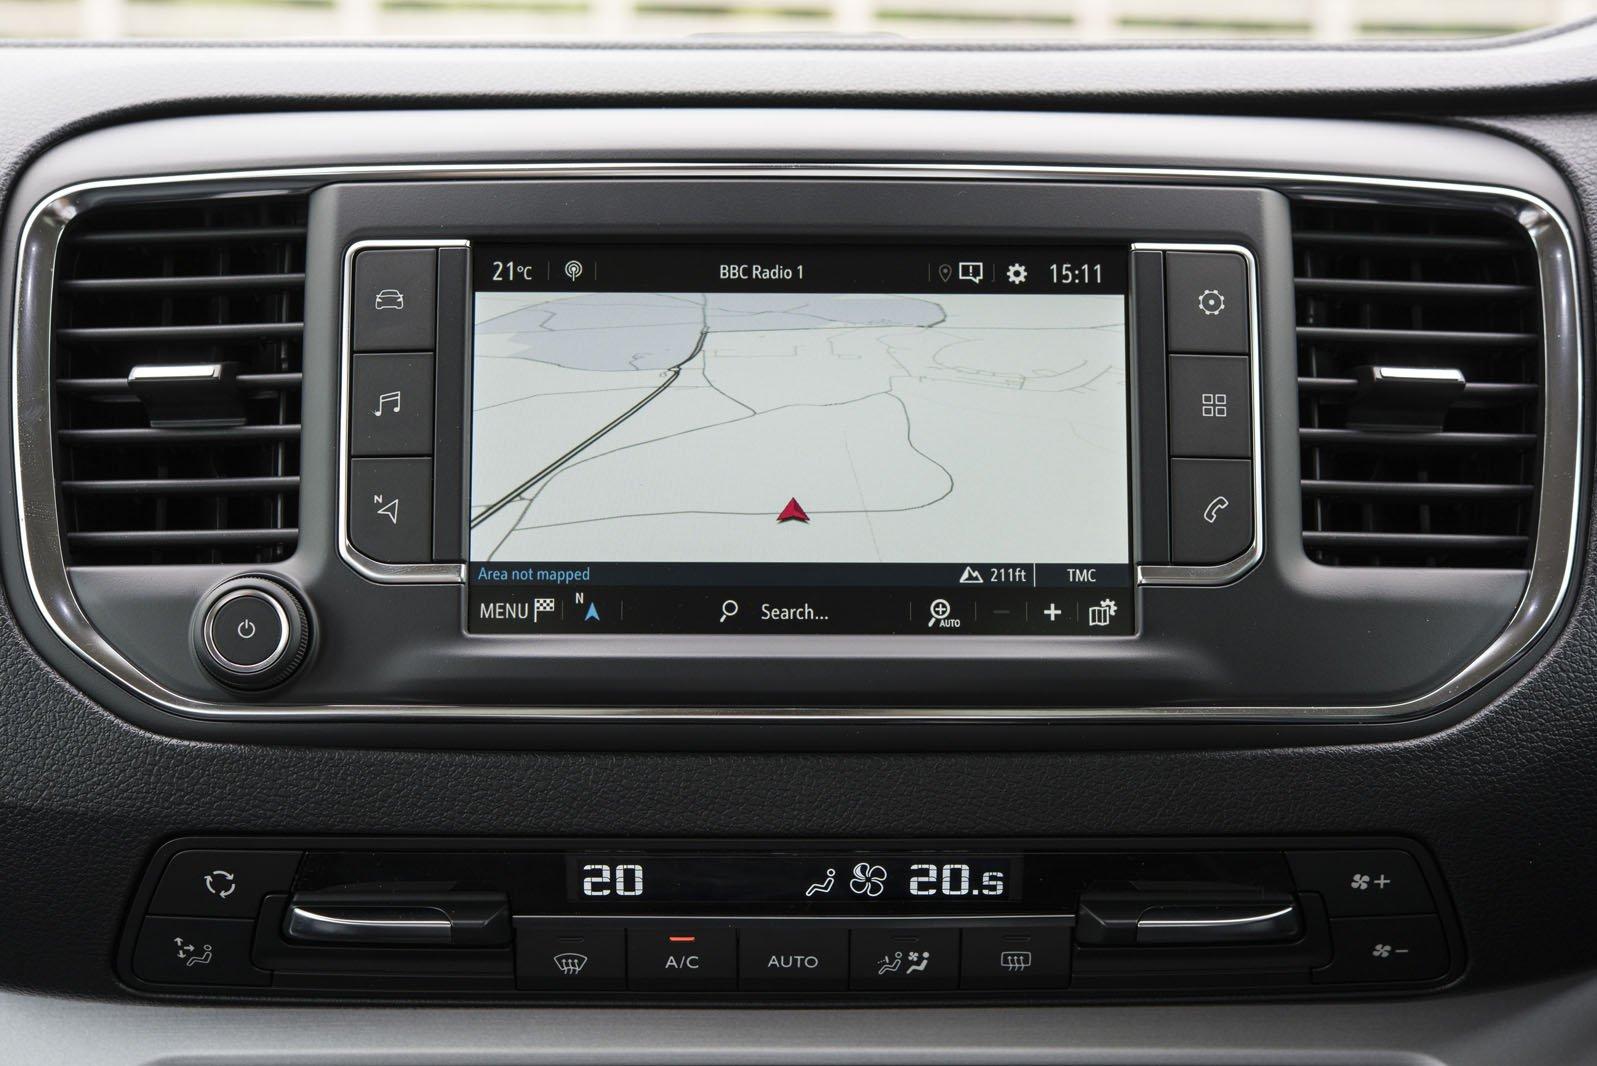 Vauxhall Vivaro Life 2019 RHD infotainment